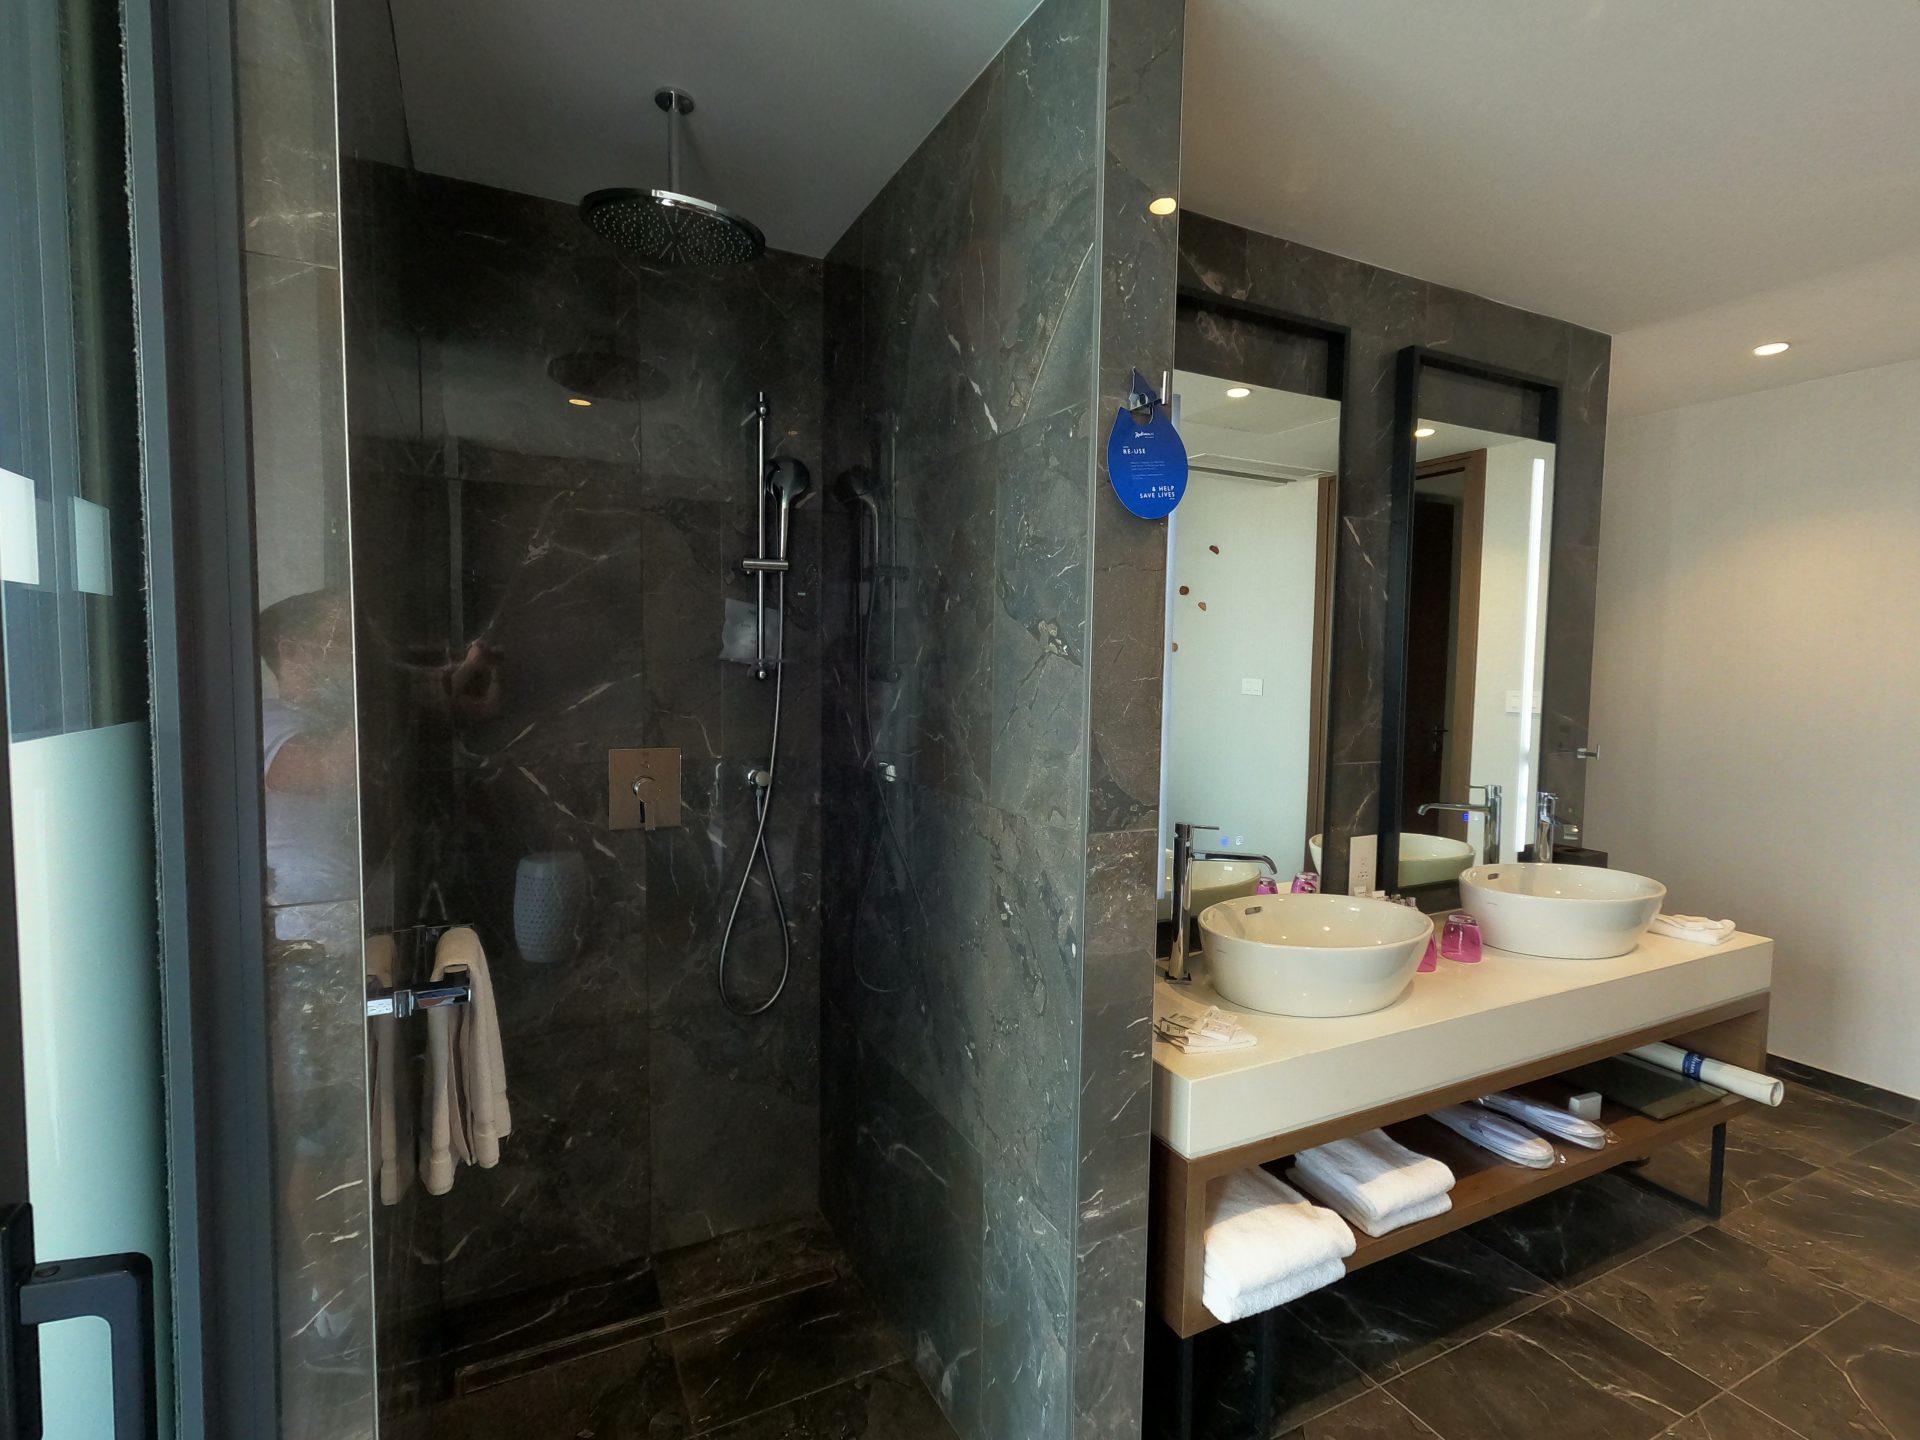 Rain shower in the bathroom